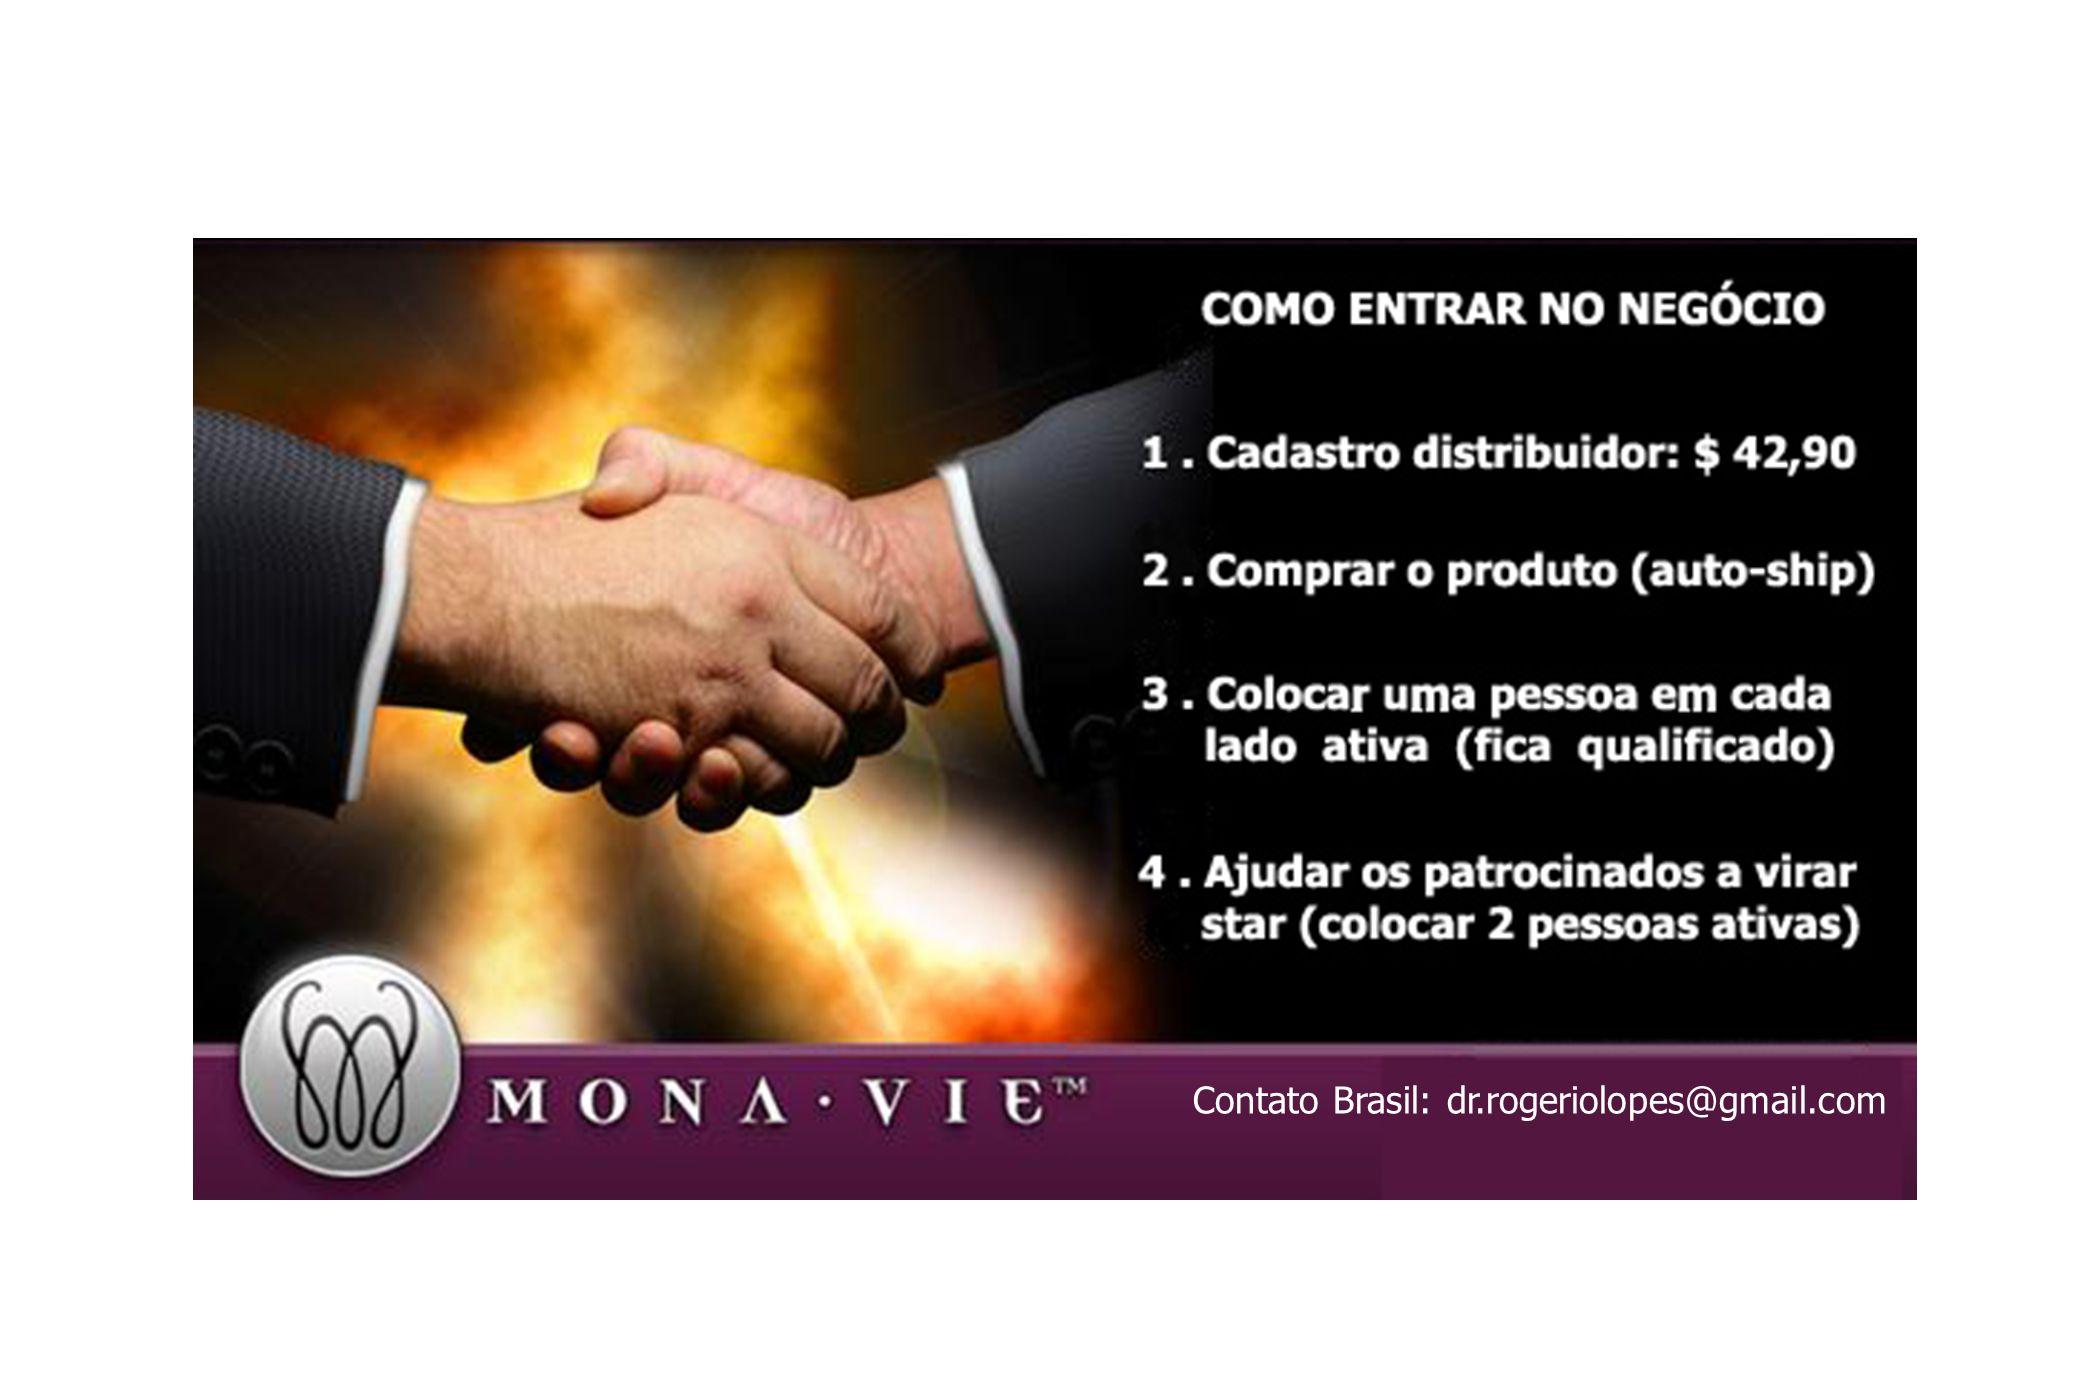 Contato Brasil: dr.rogeriolopes@gmail.com